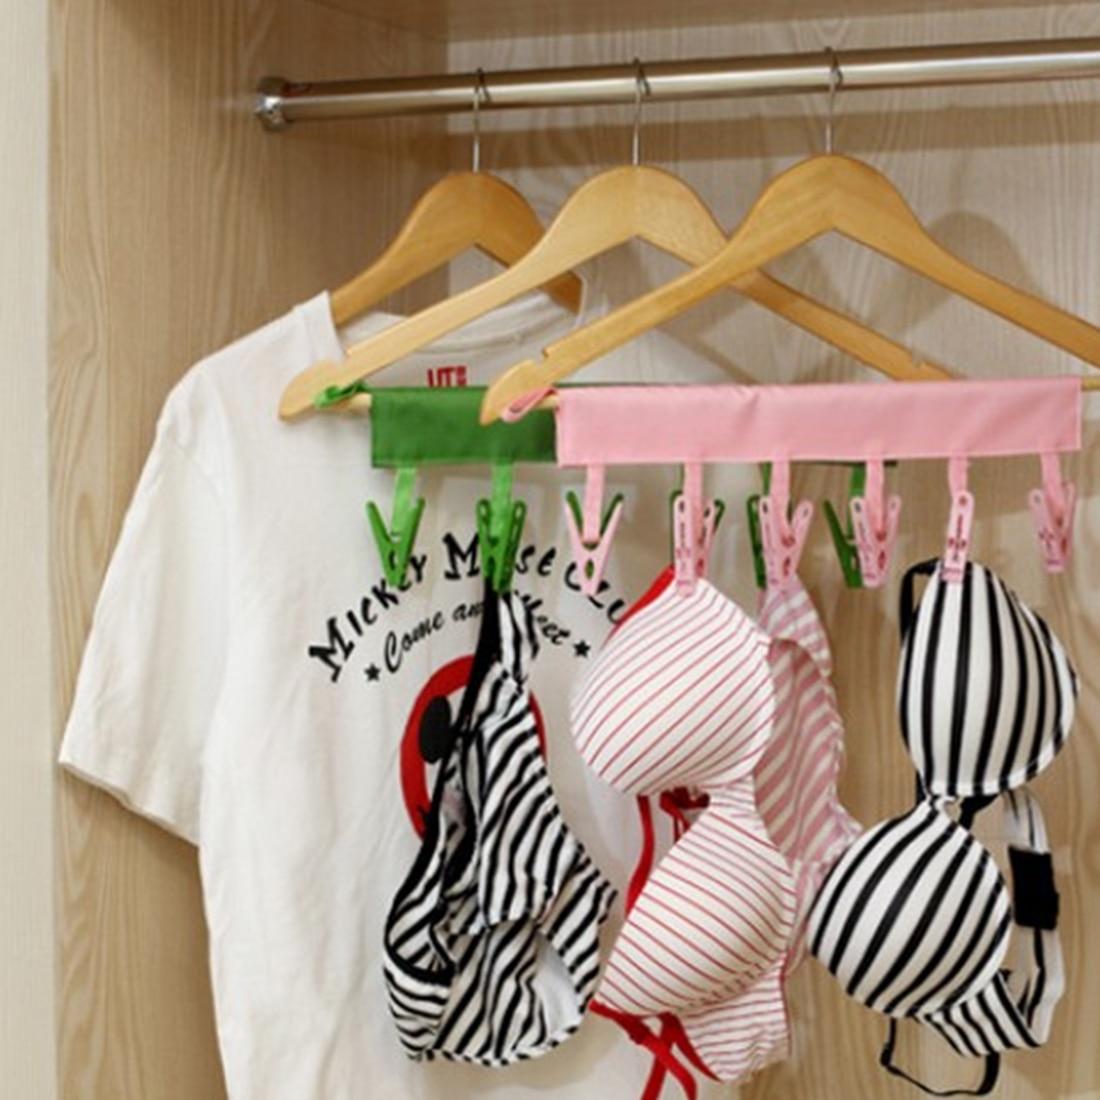 Practical Dacron Plastic Portable Bathrooms Cloth Hanger Rack Clothespin Business Travel Portable Folding Cloth Hanger Clips